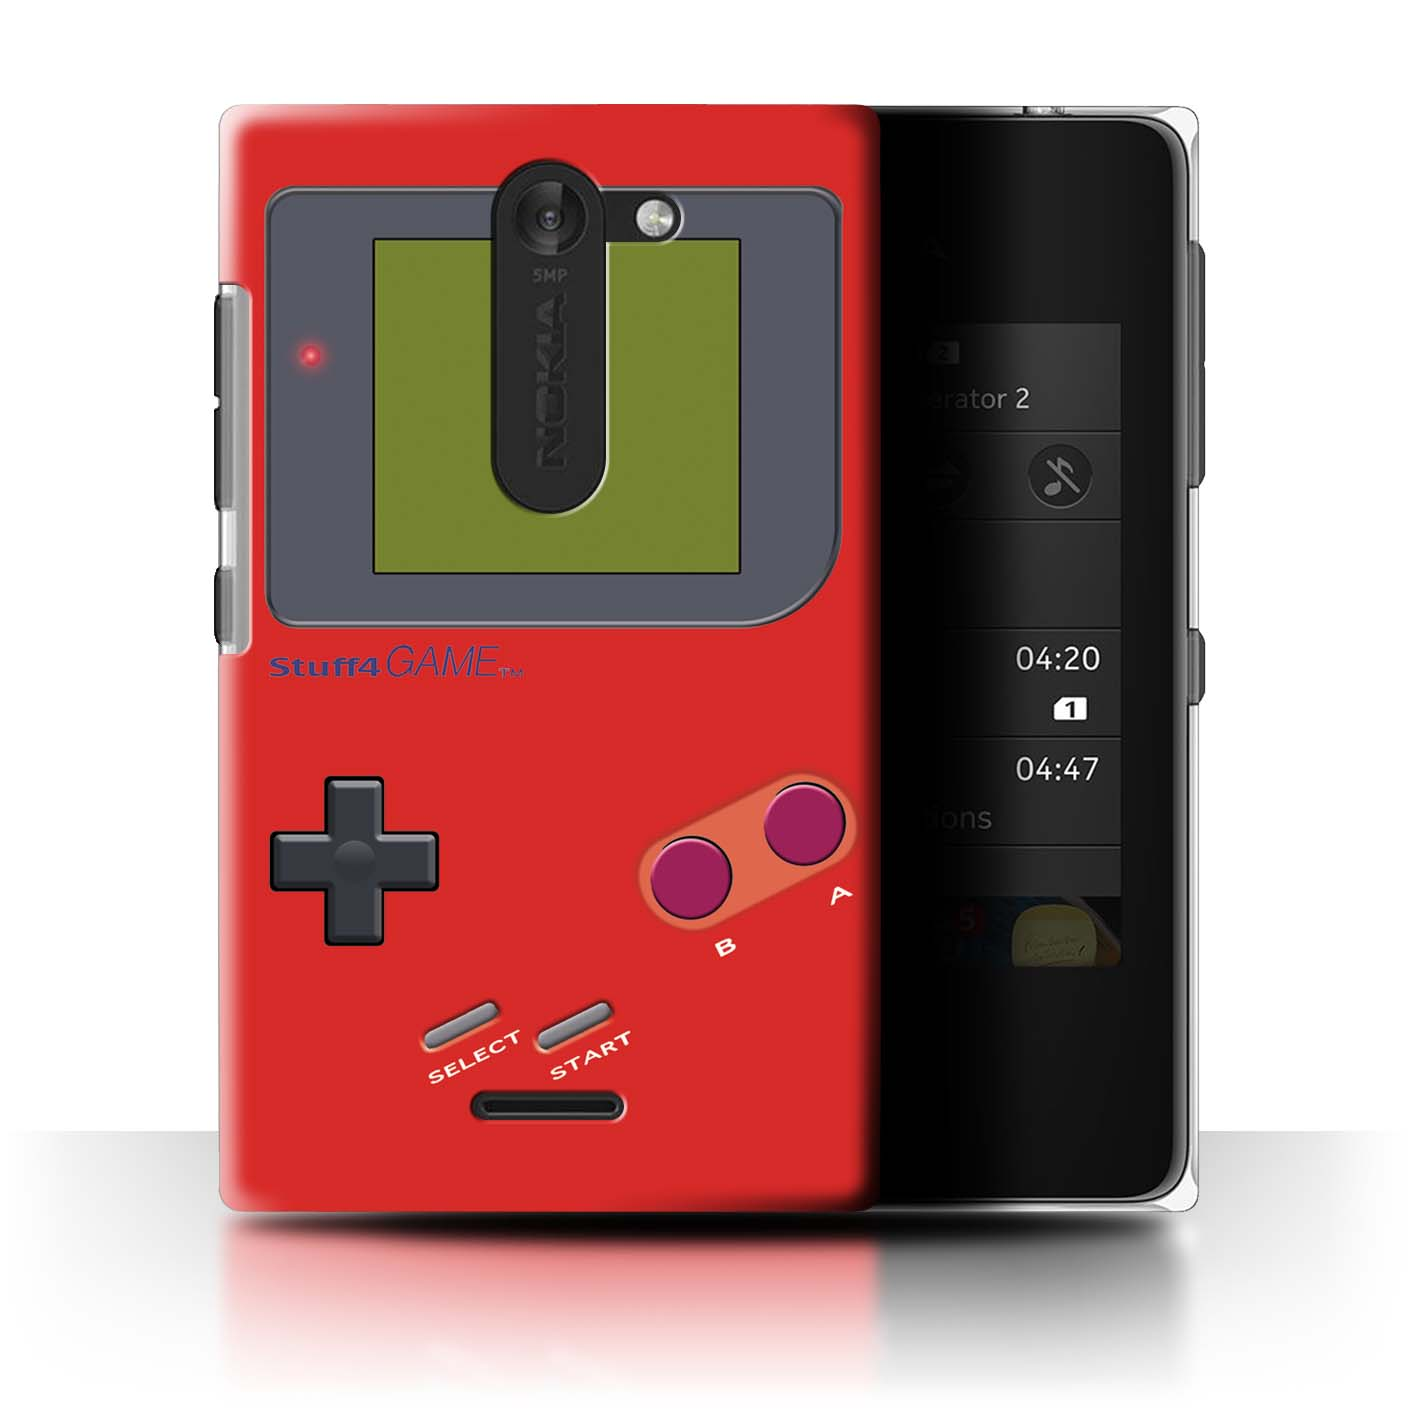 STUFF4-Back-Case-Cover-Skin-for-Nokia-Asha-502-Dual-Video-Gamer-Gameboy